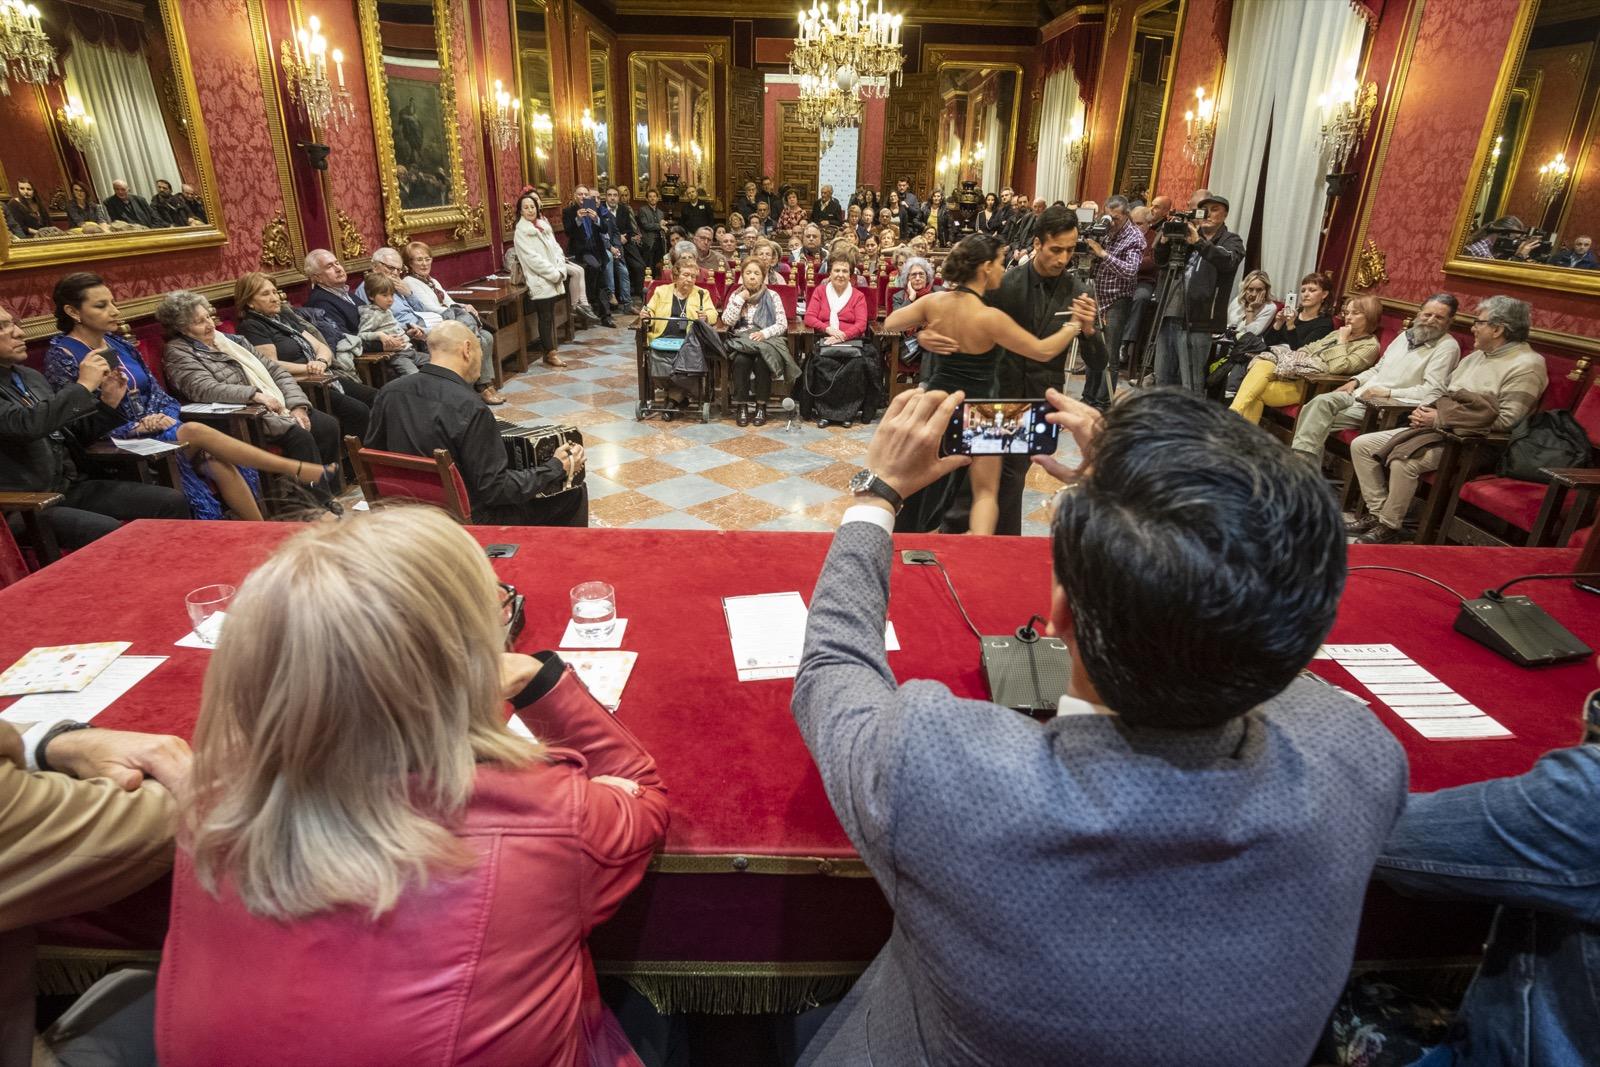 Arranca el Festival Internacional de Tango de Granada 2019